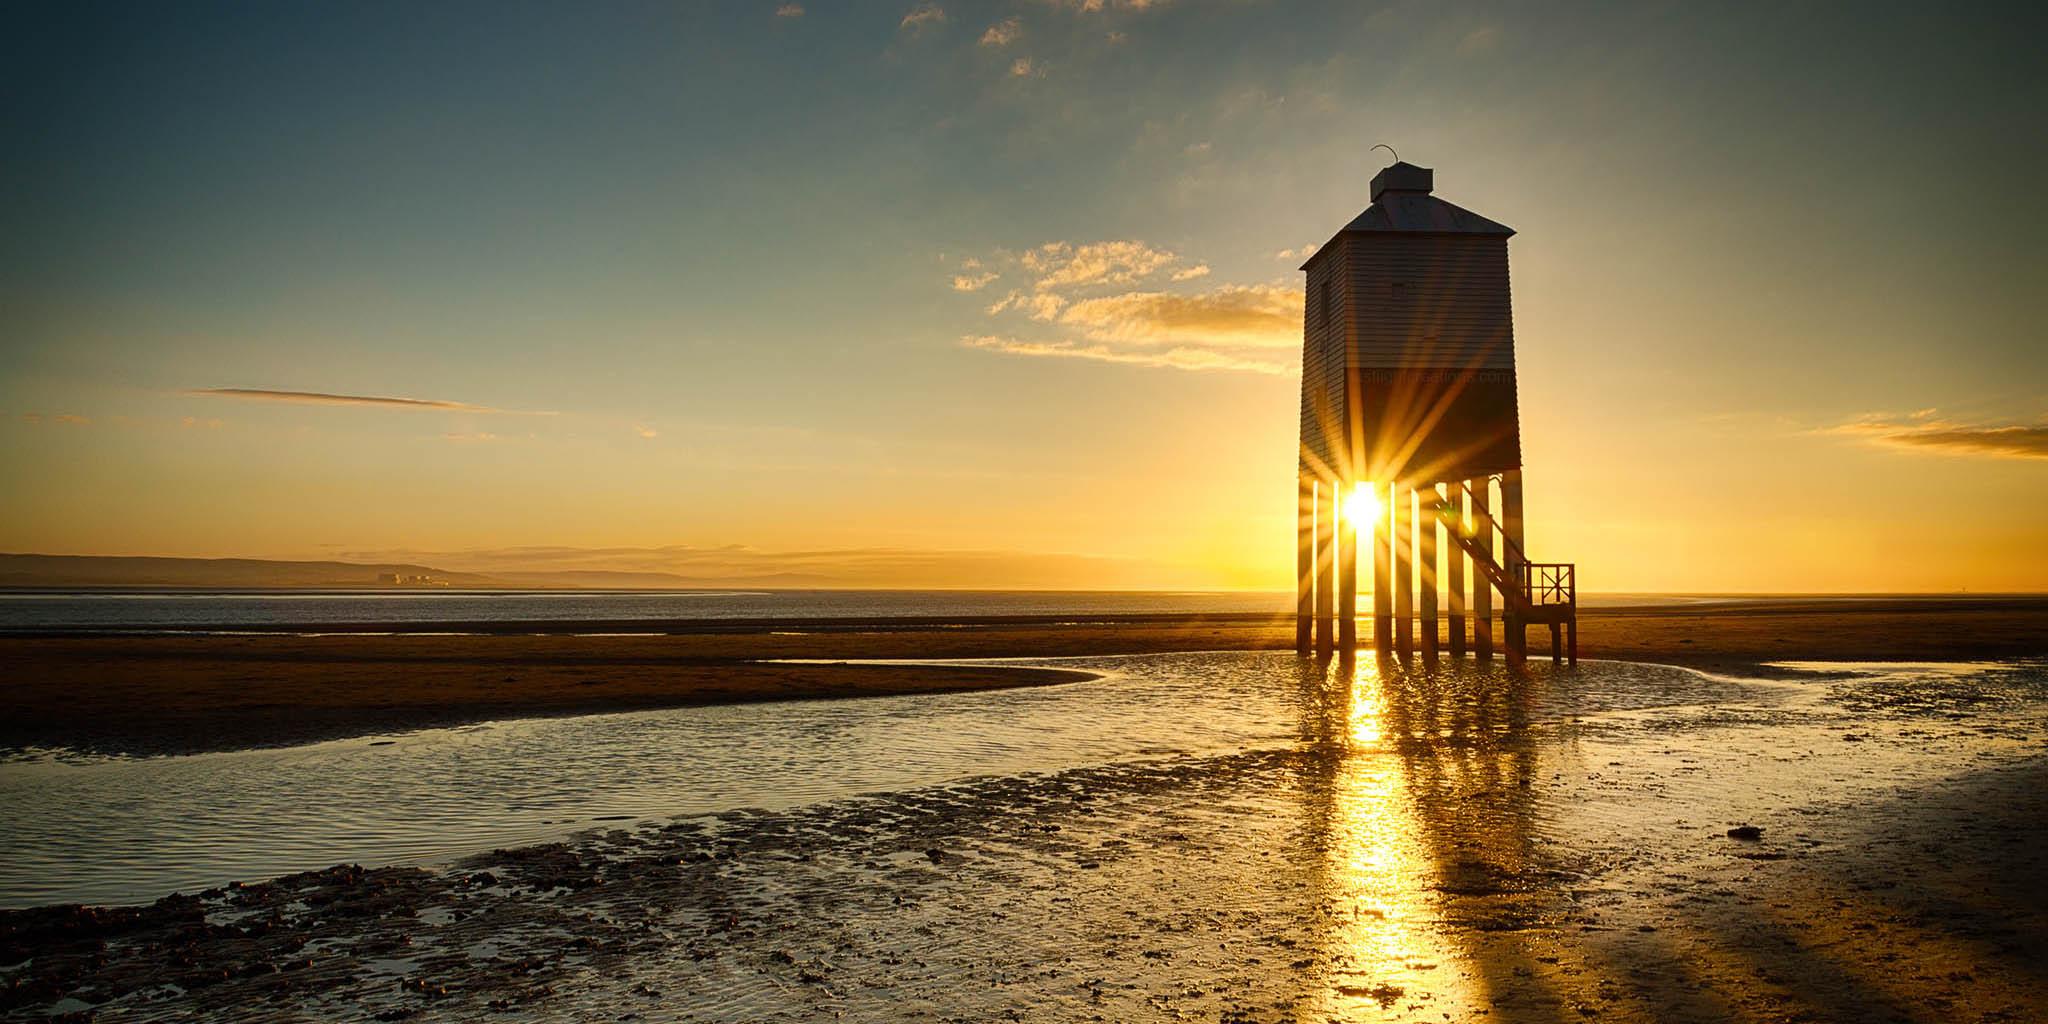 Burnham-On-Sea Low Lighthouse